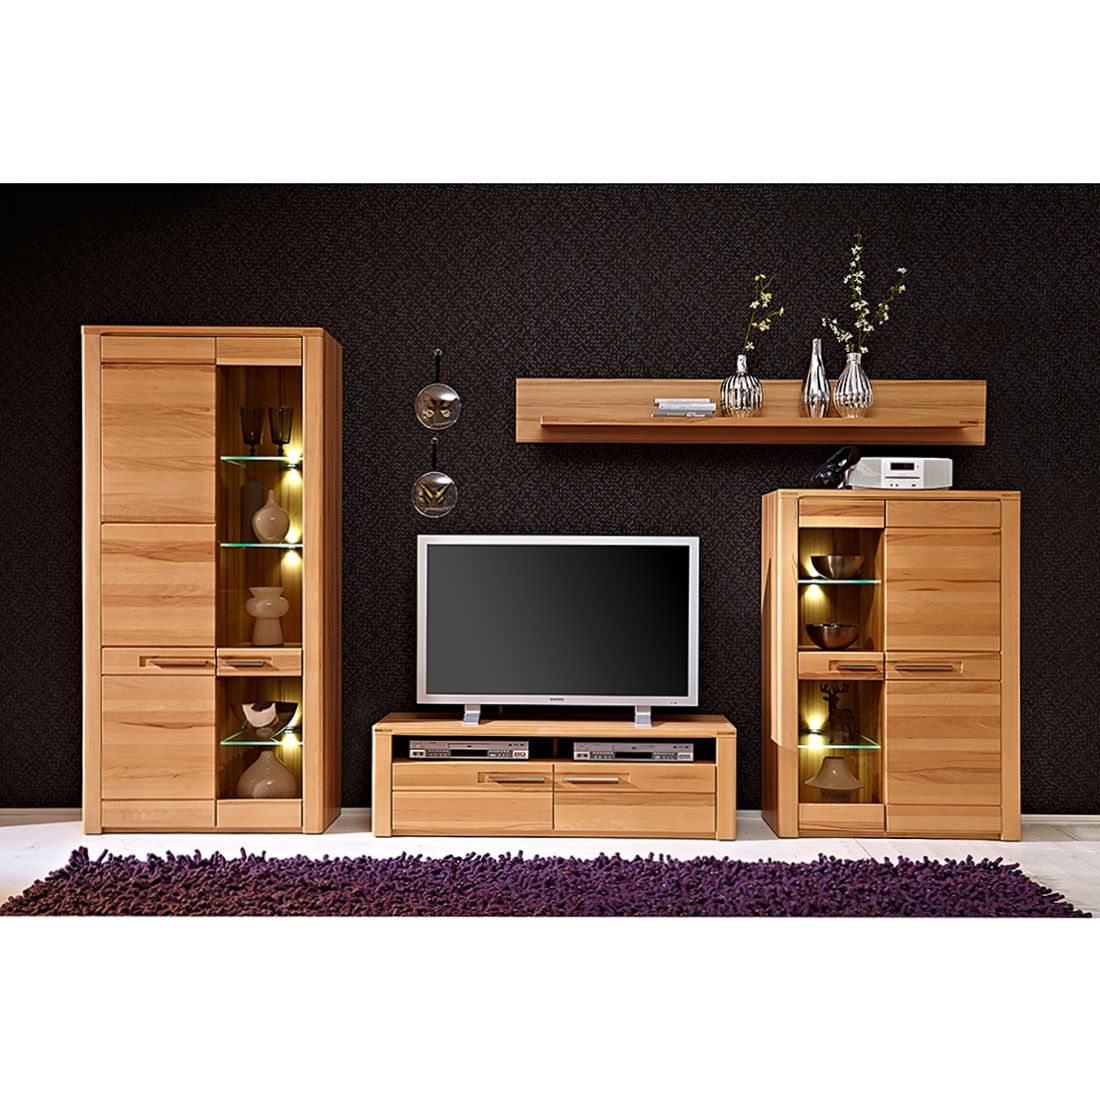 Great Wohnwnde Holz Massiv Modern With Wohnwnde Holz Massiv Modern